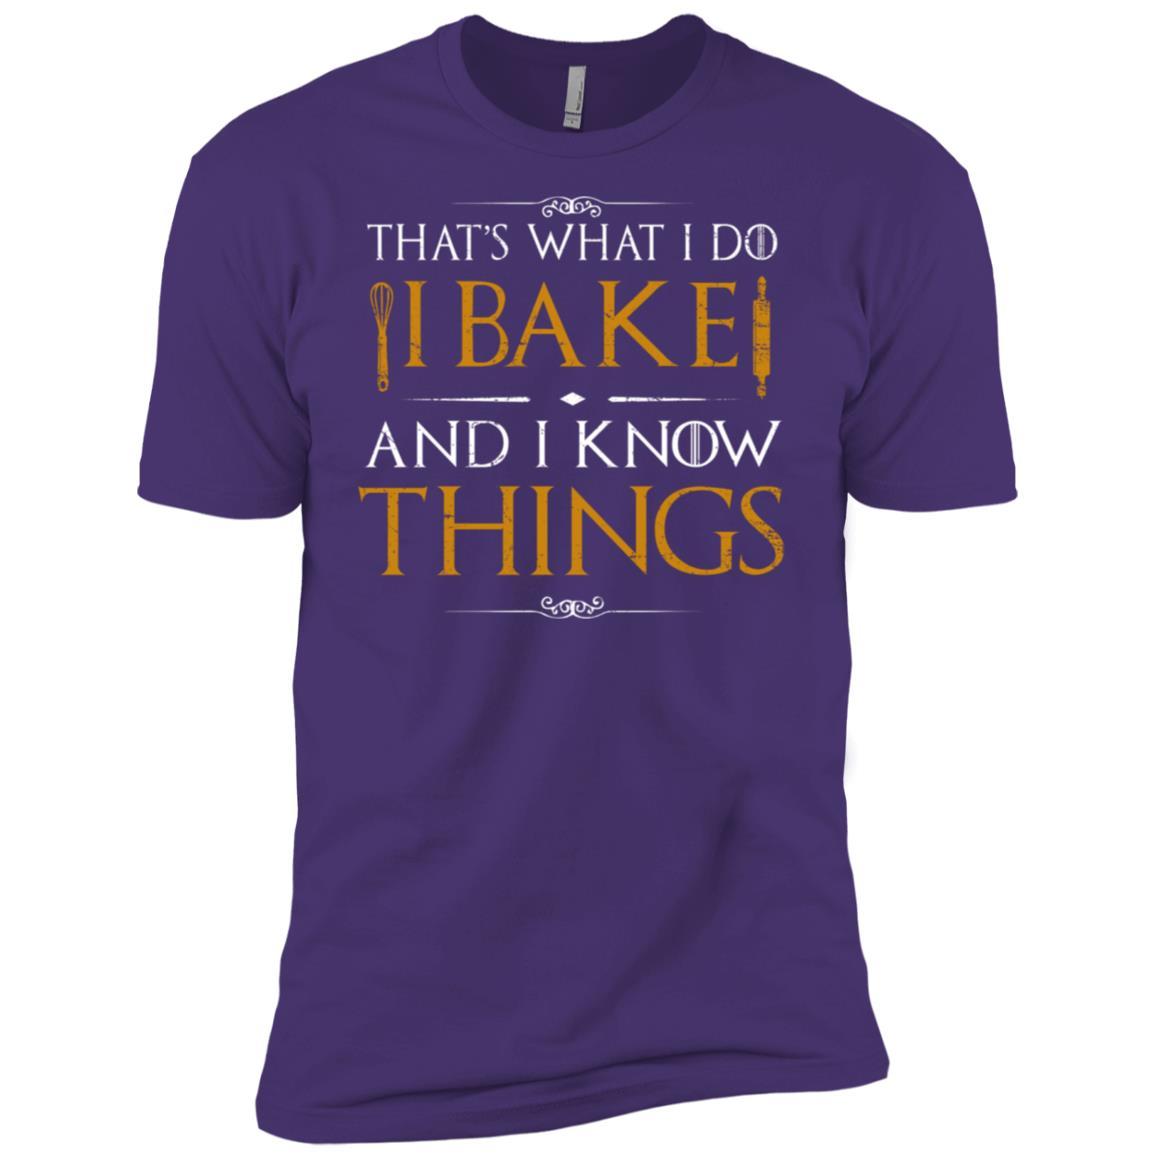 I Bake and I Know Things, Funny Baking Baker Gift Shir Men Short Sleeve T-Shirt